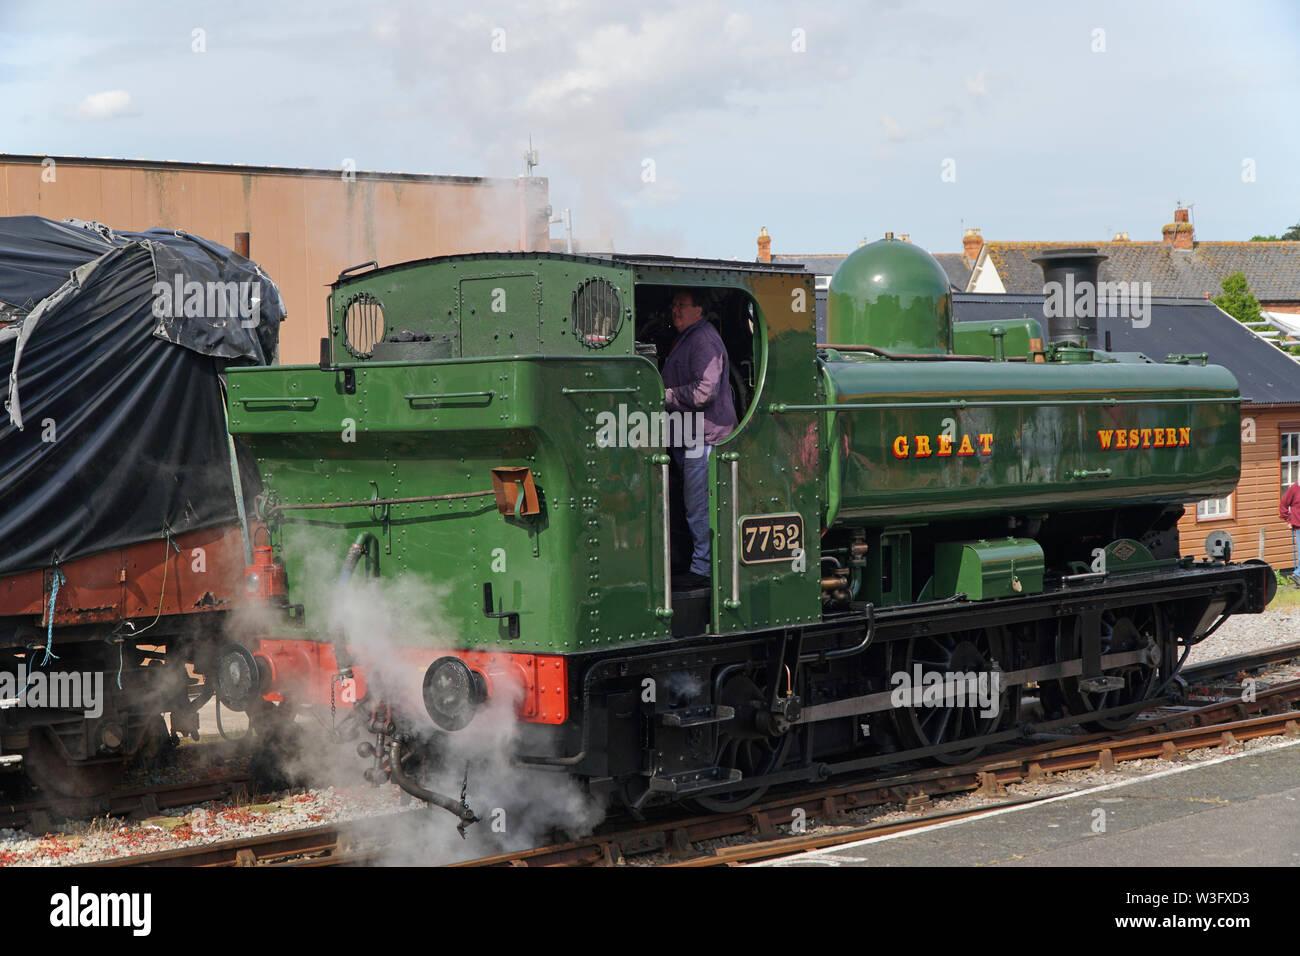 Great Western vintage steam engine 7752 at Minehead station - Stock Image